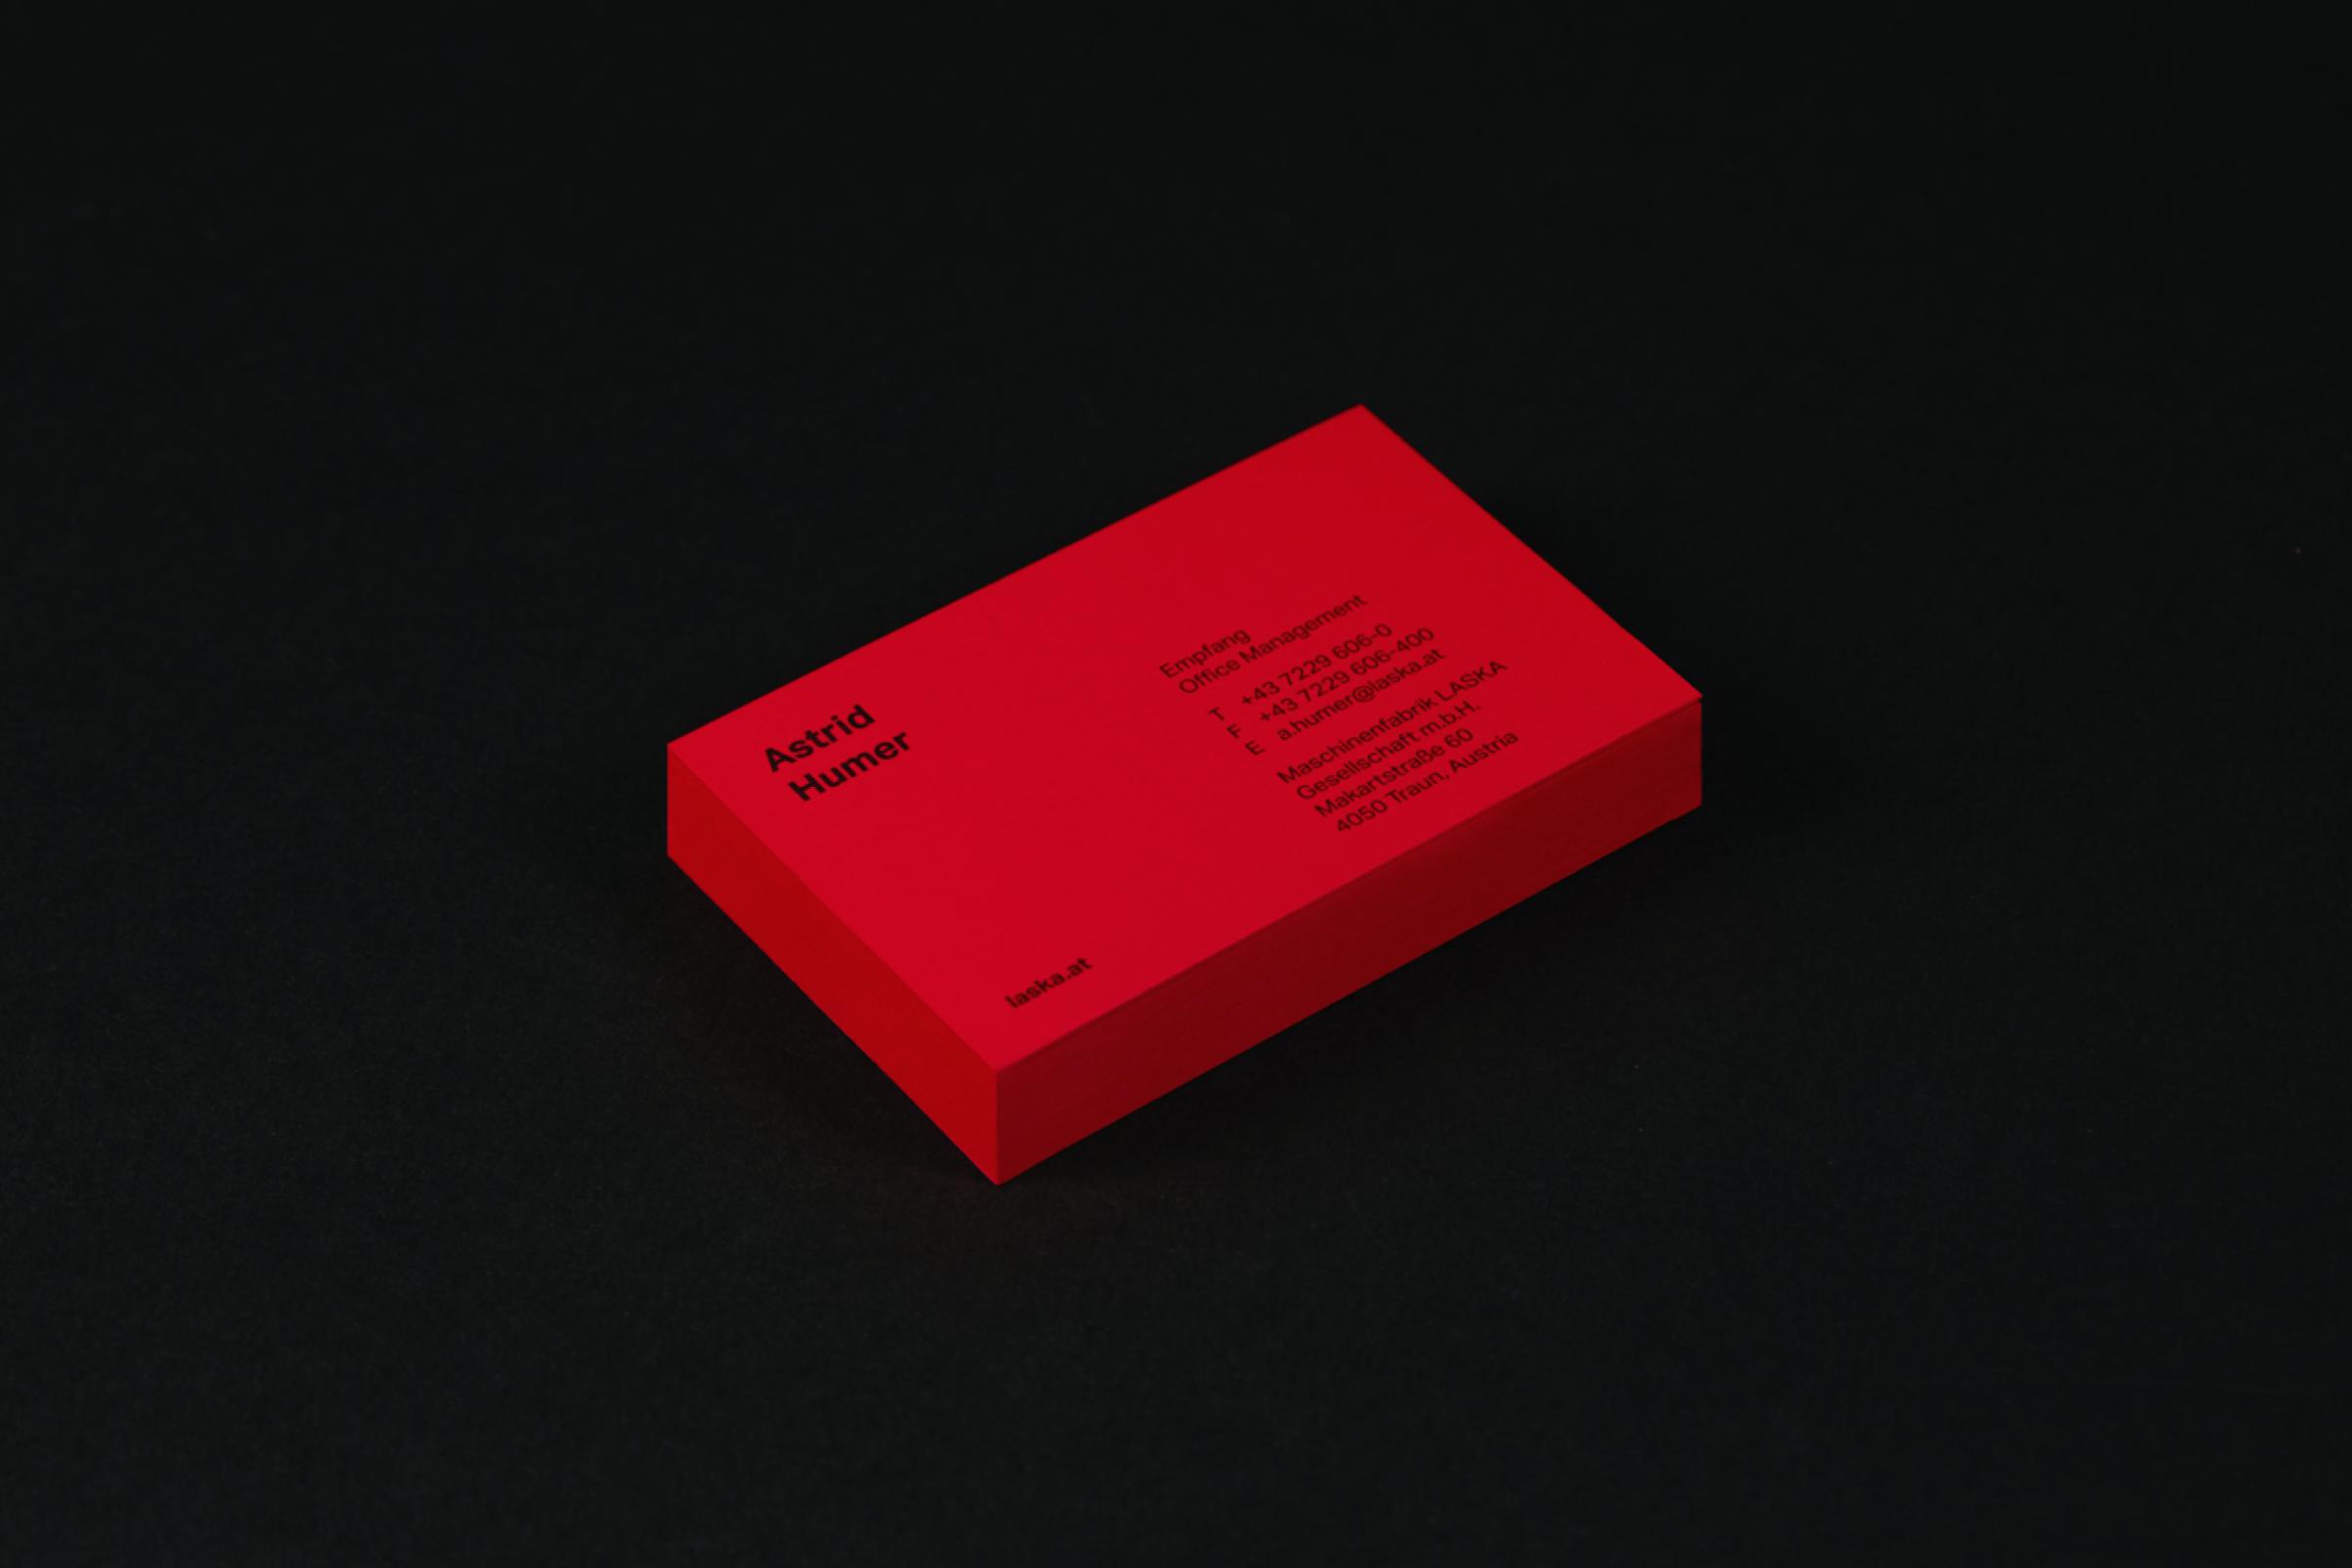 Ref Laska Branding 012 L Vk